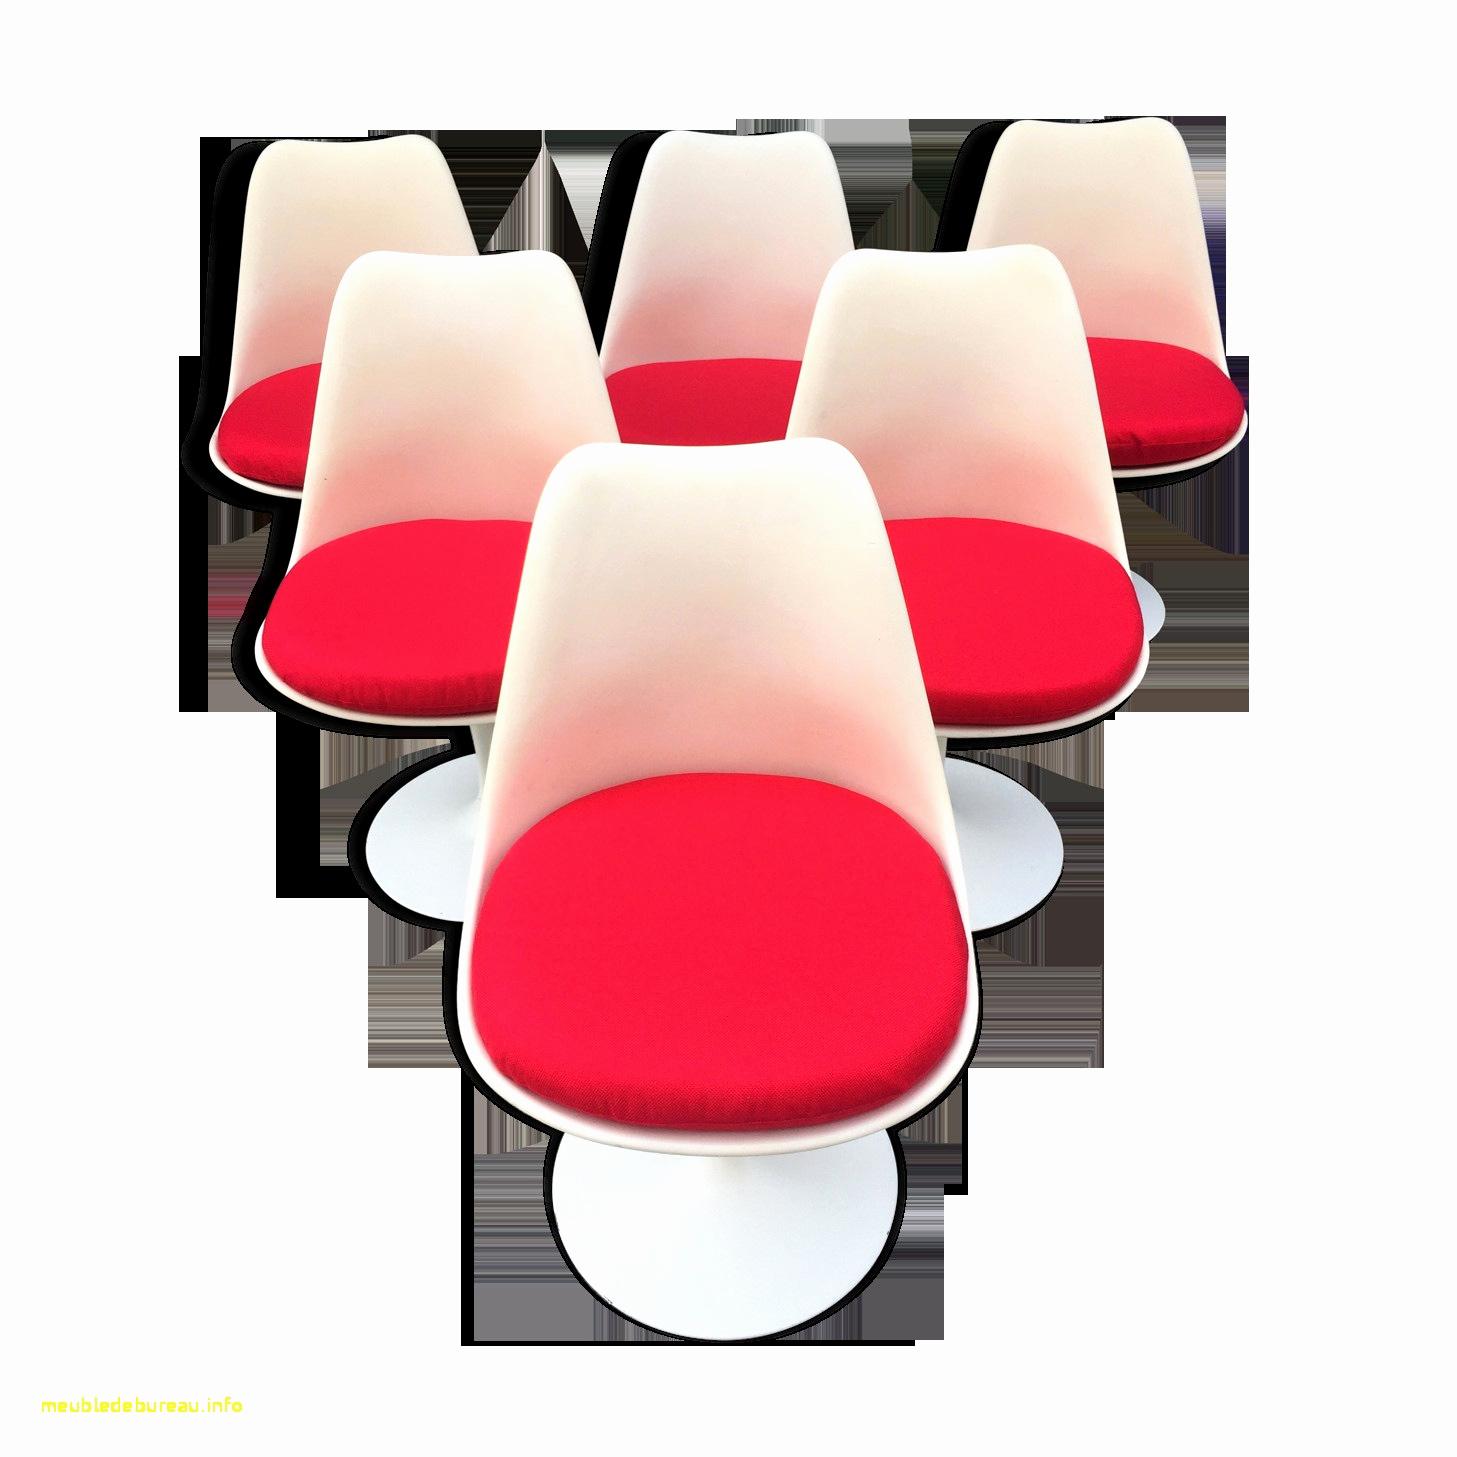 fauteuil pas cher occasion luxe fauteuille oeuf luxe fauteuil oeuf pas cher frais fauteuil oeuf of fauteuil pas cher occasion